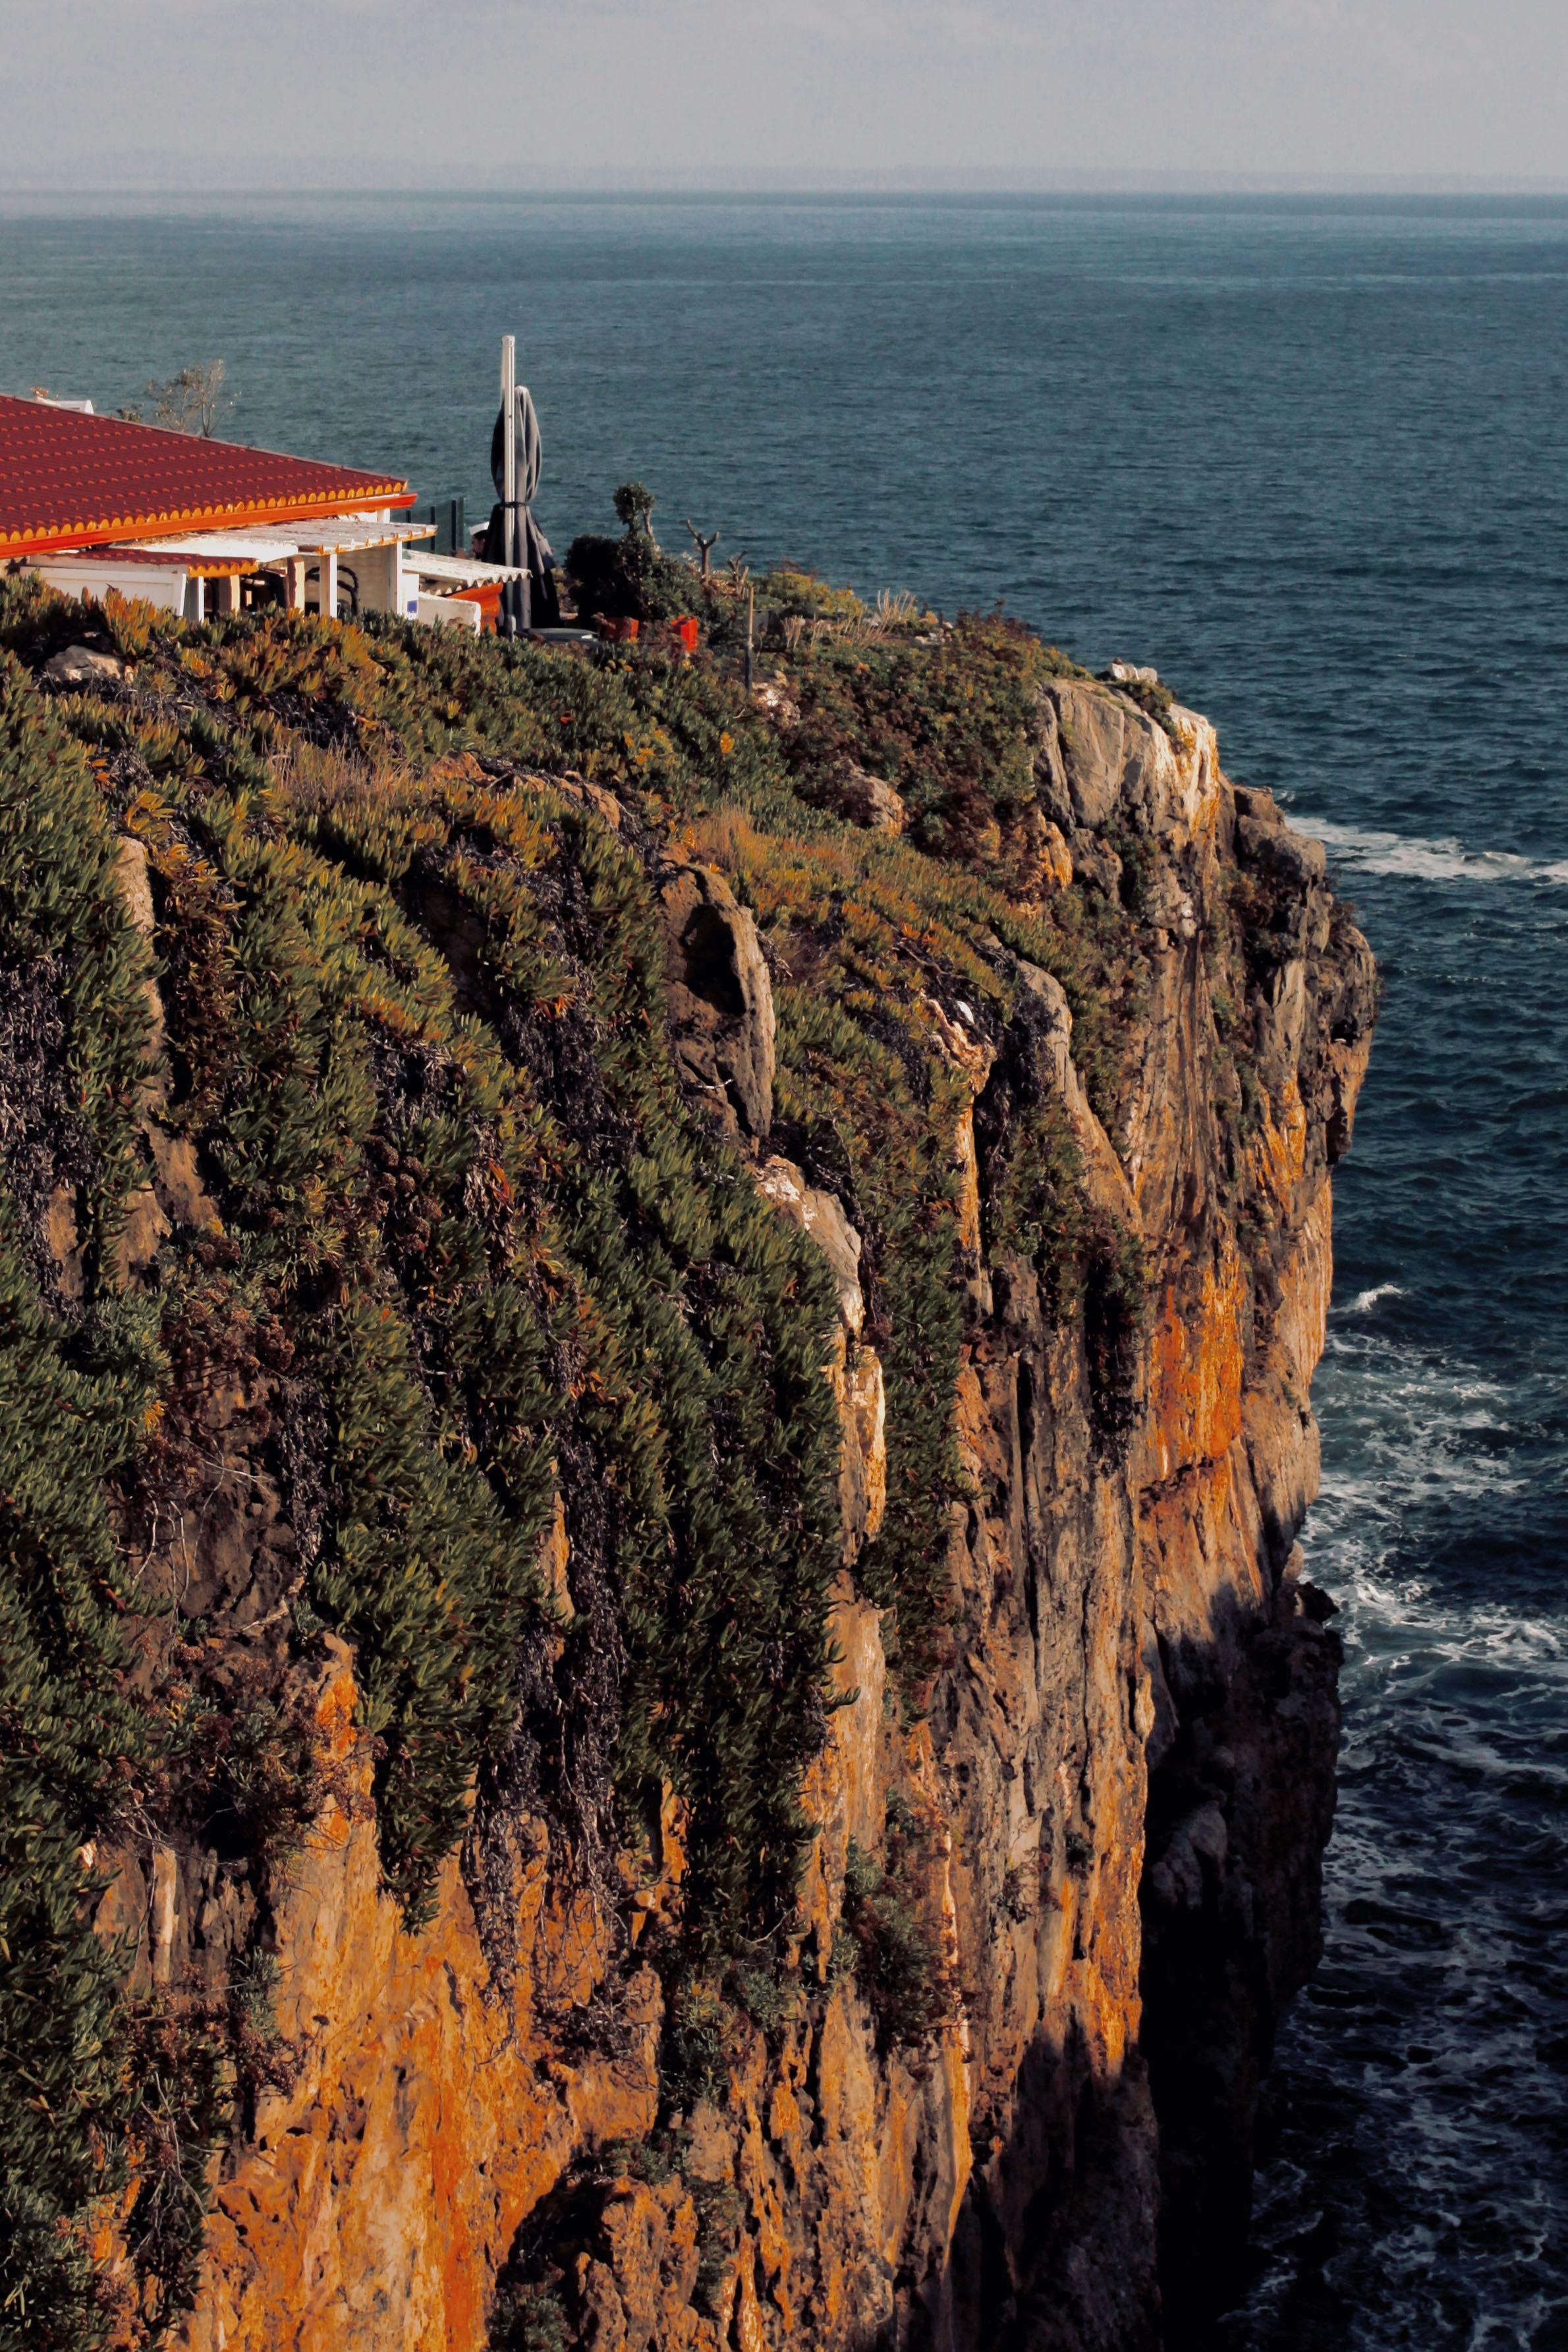 Cliffs of Boca do Inferno